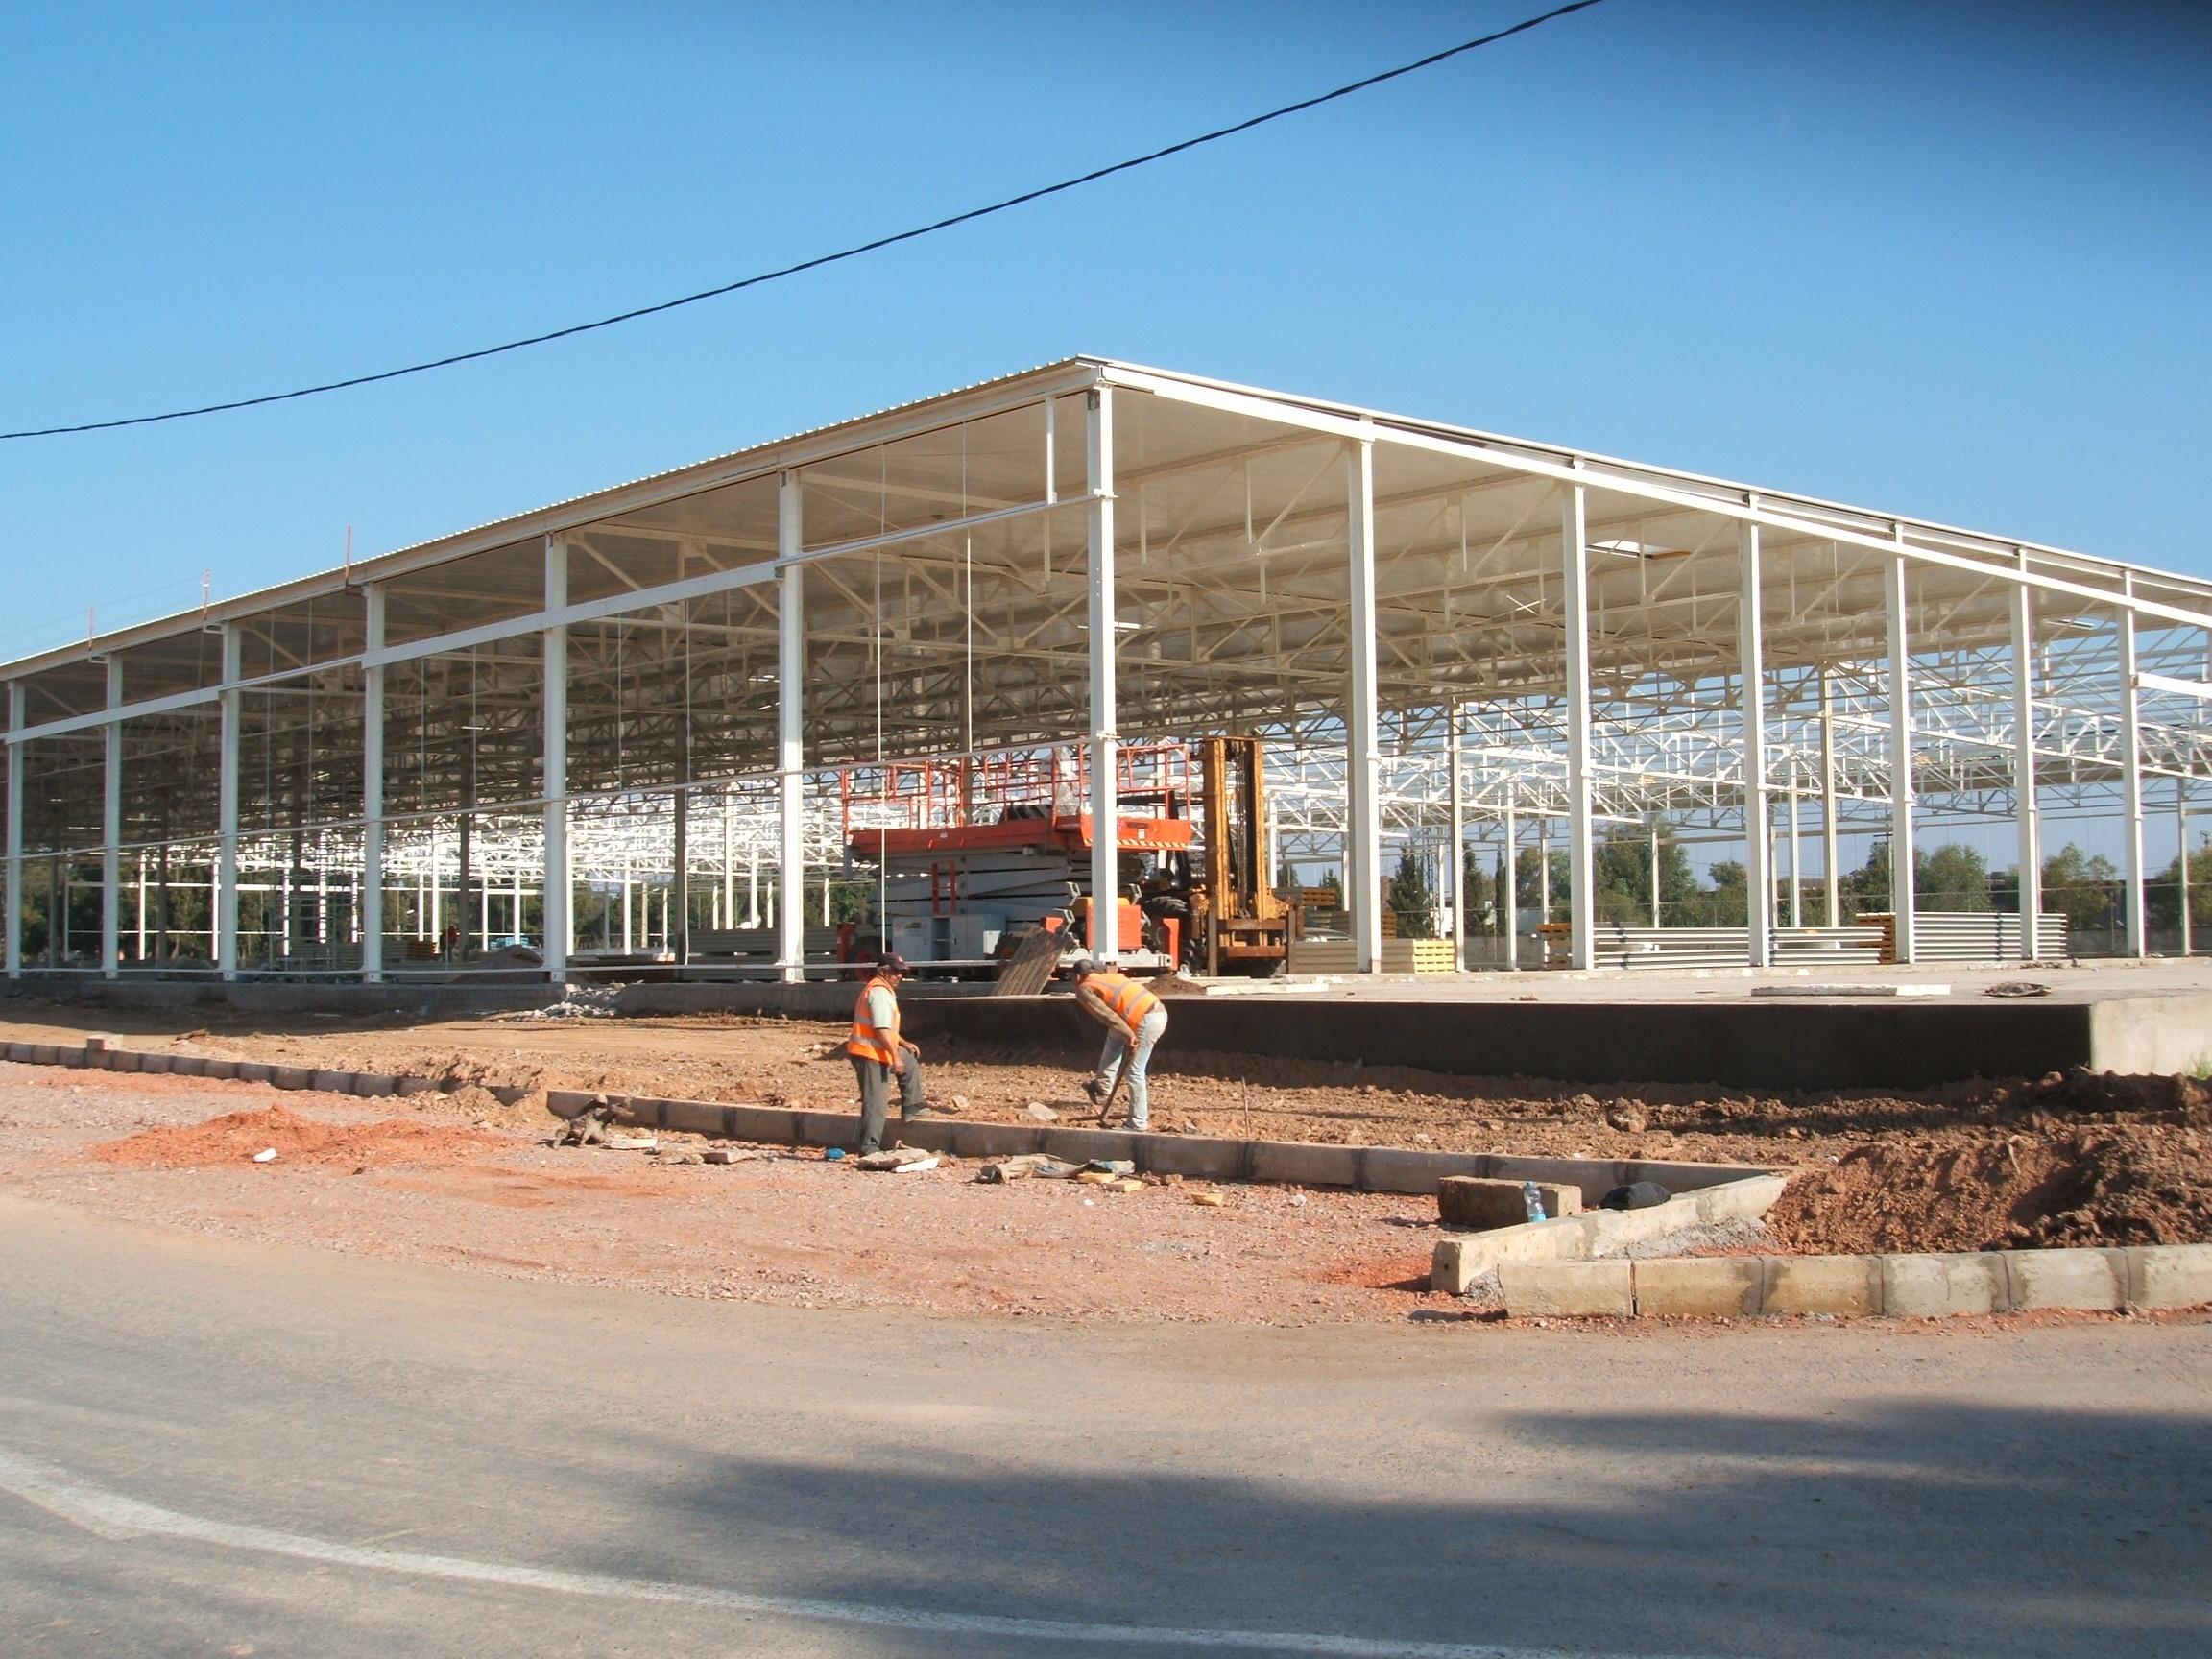 Morocco: Construction of the new hangar